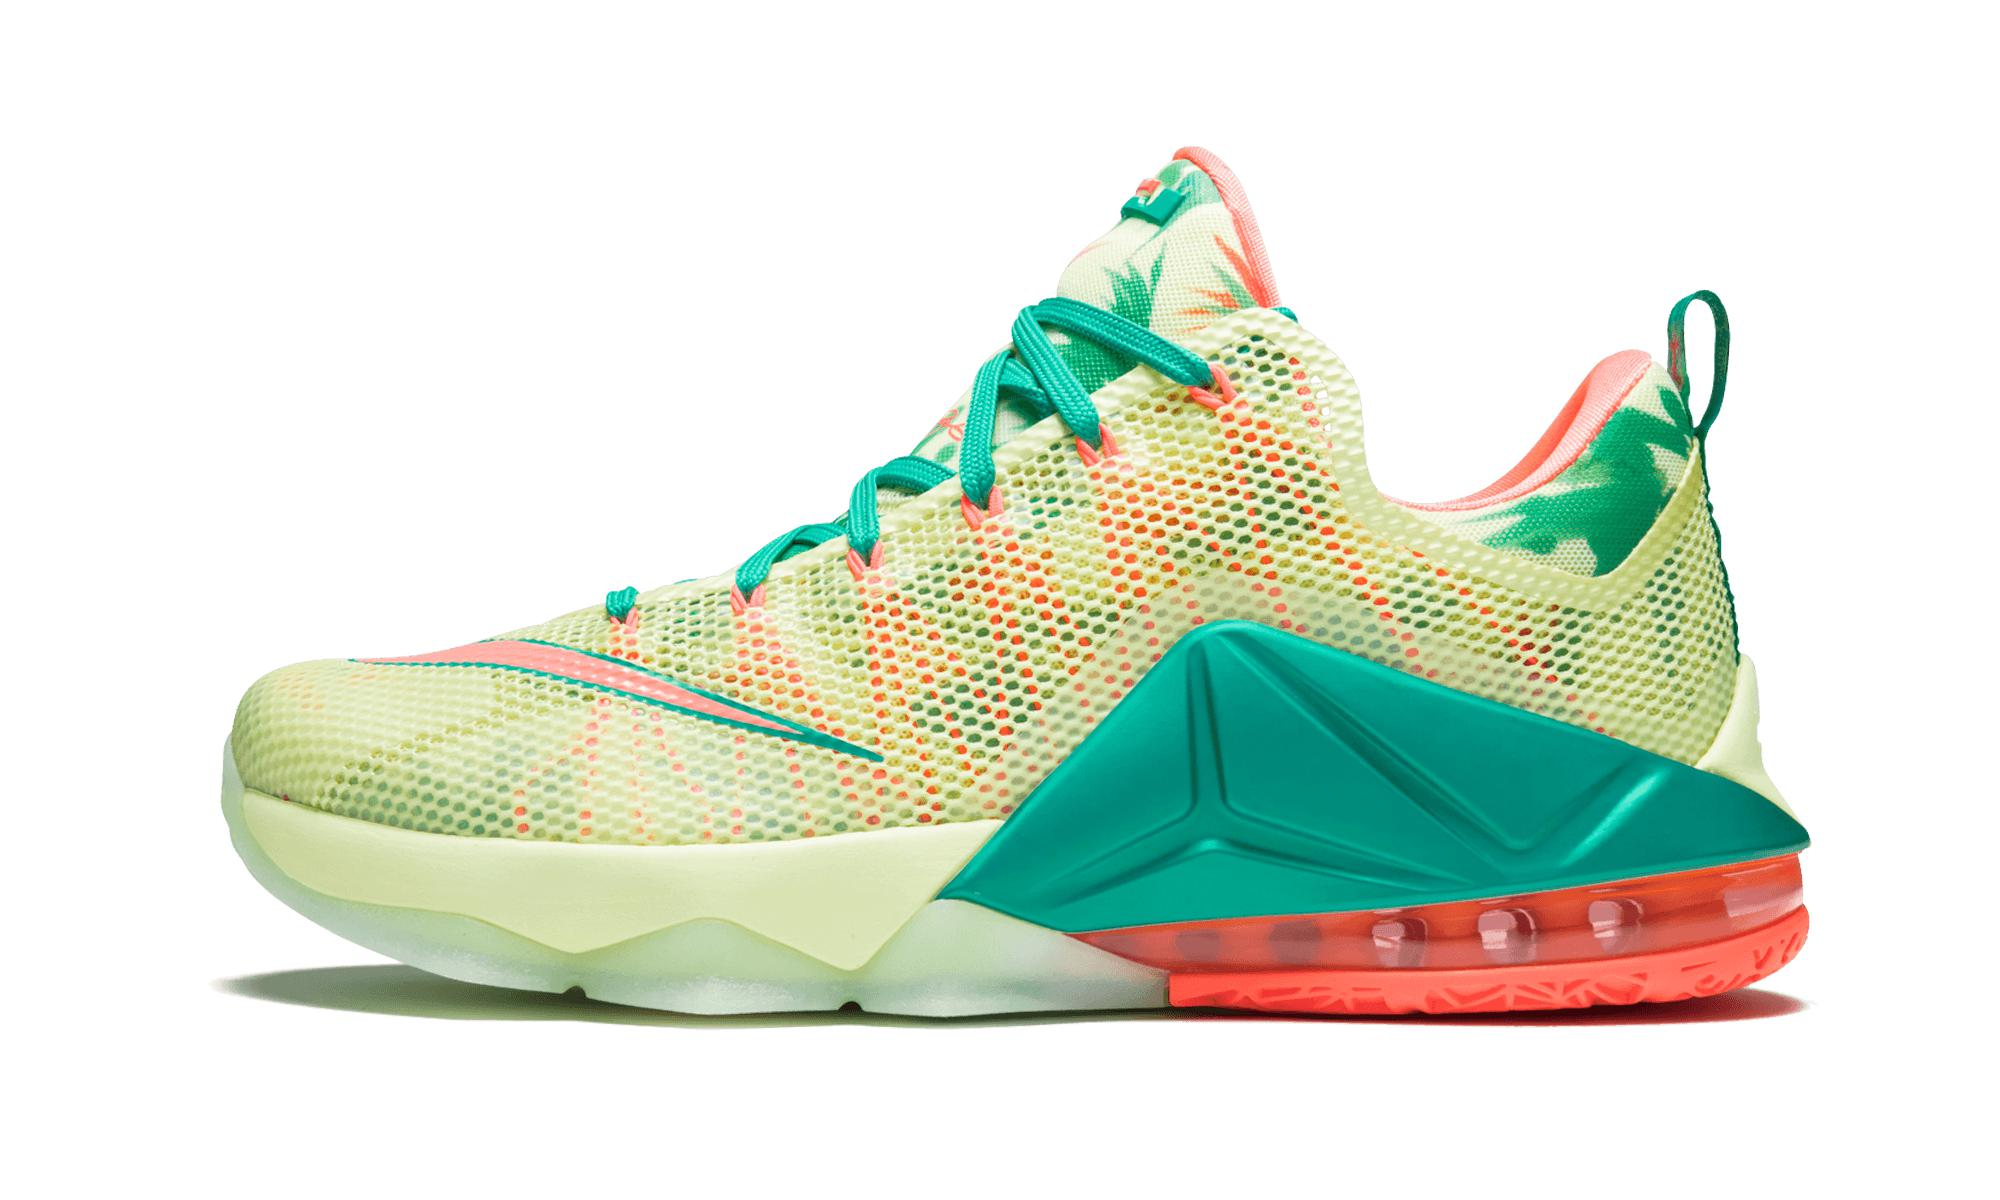 Nike Lebron 12 Low Prm for Men - Lyst 7d4c151aa